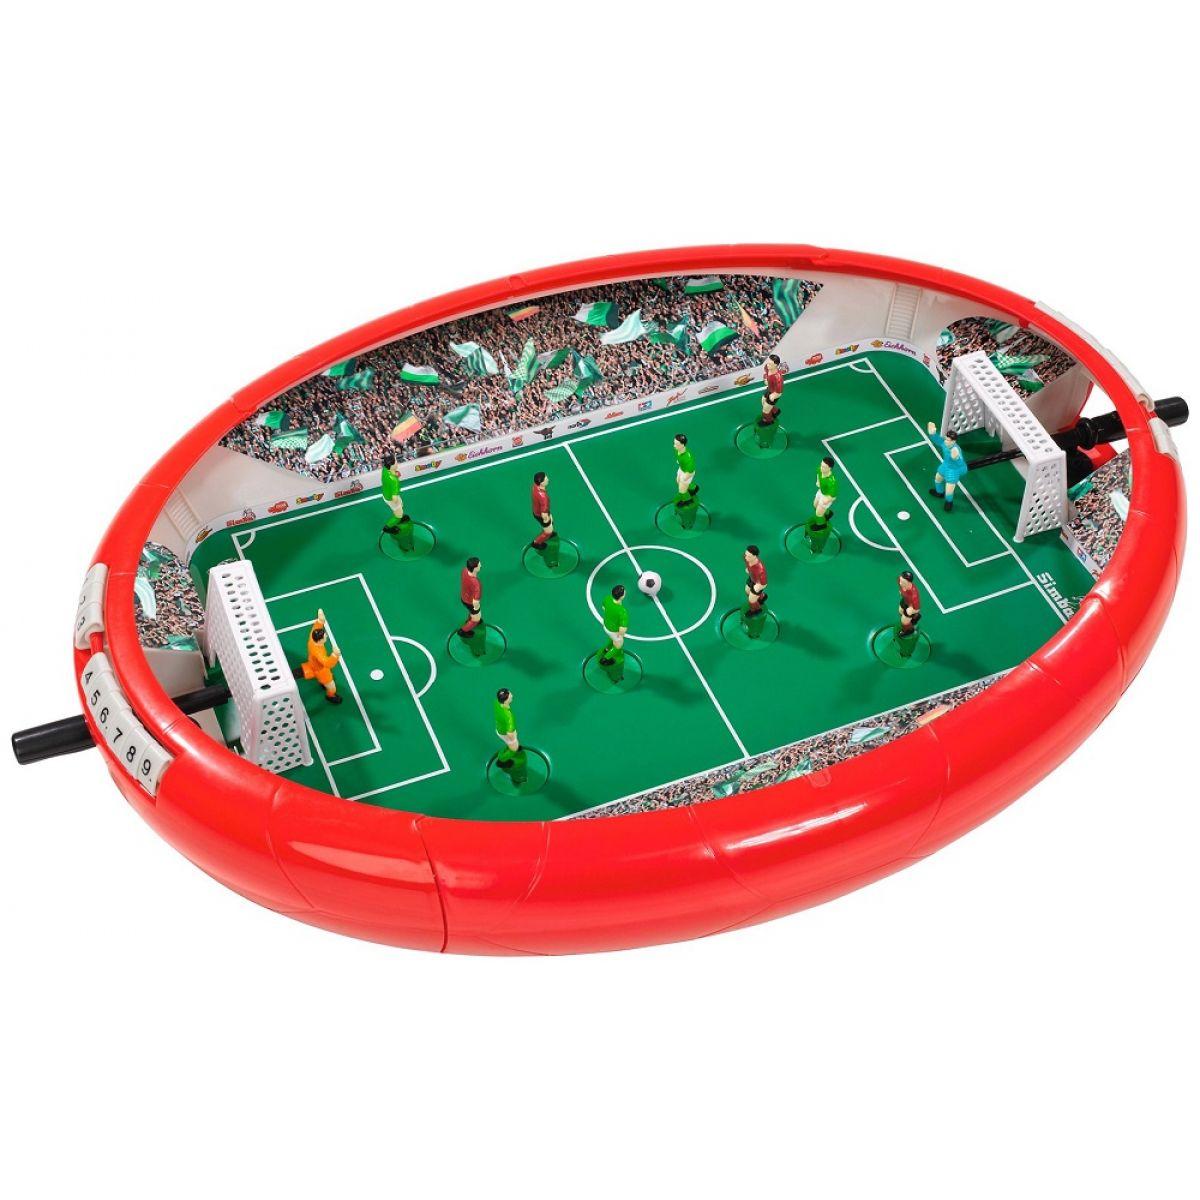 Simba Games & More Fotbal Arena